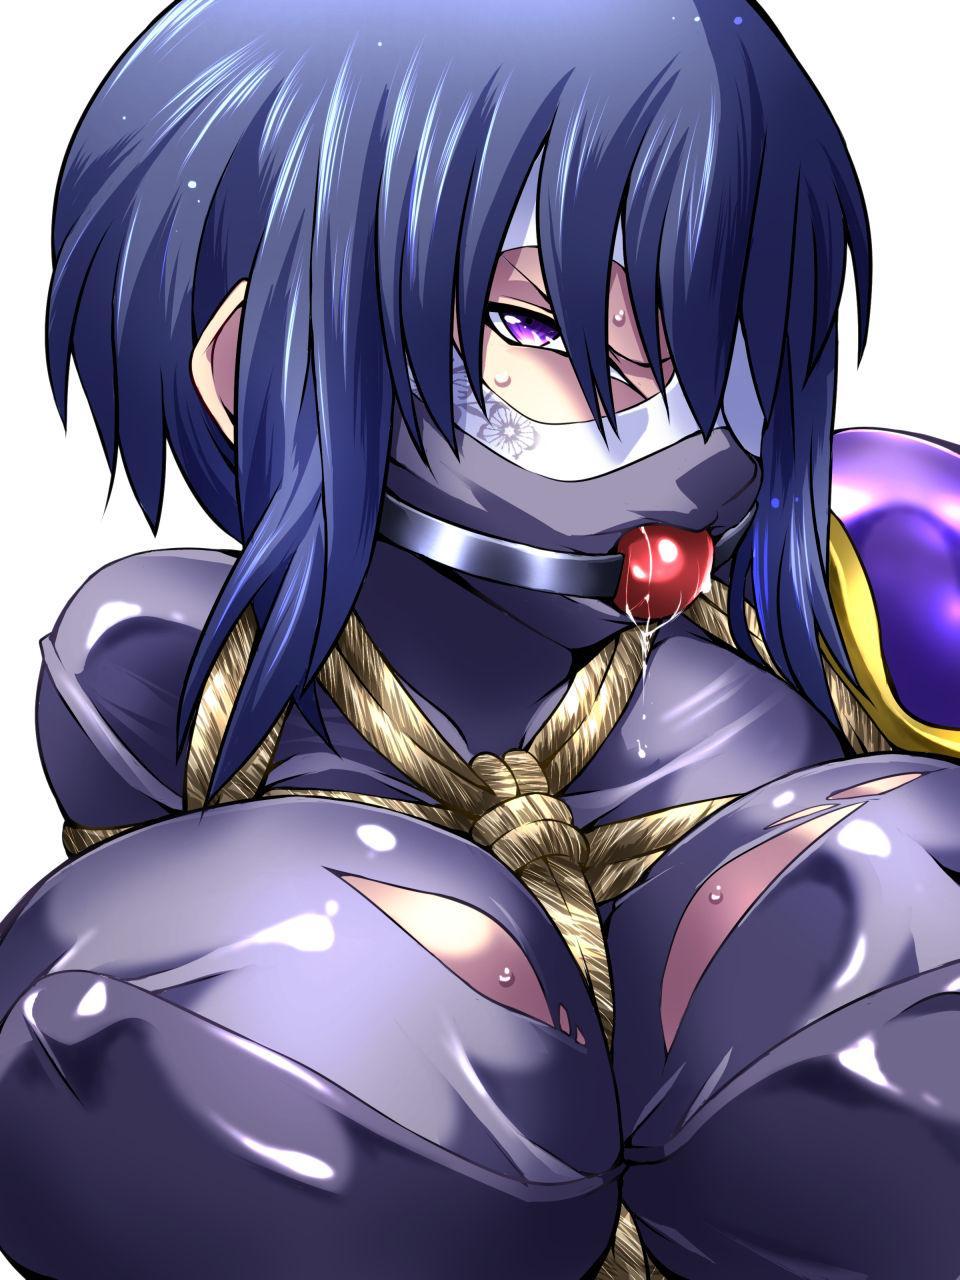 [Atelier Hachifukuan] Superheroine Yuukai Ryoujoku IV - Superheroine in Distress - Kunoichi Suzushiro [English] [Harasho Project] 34